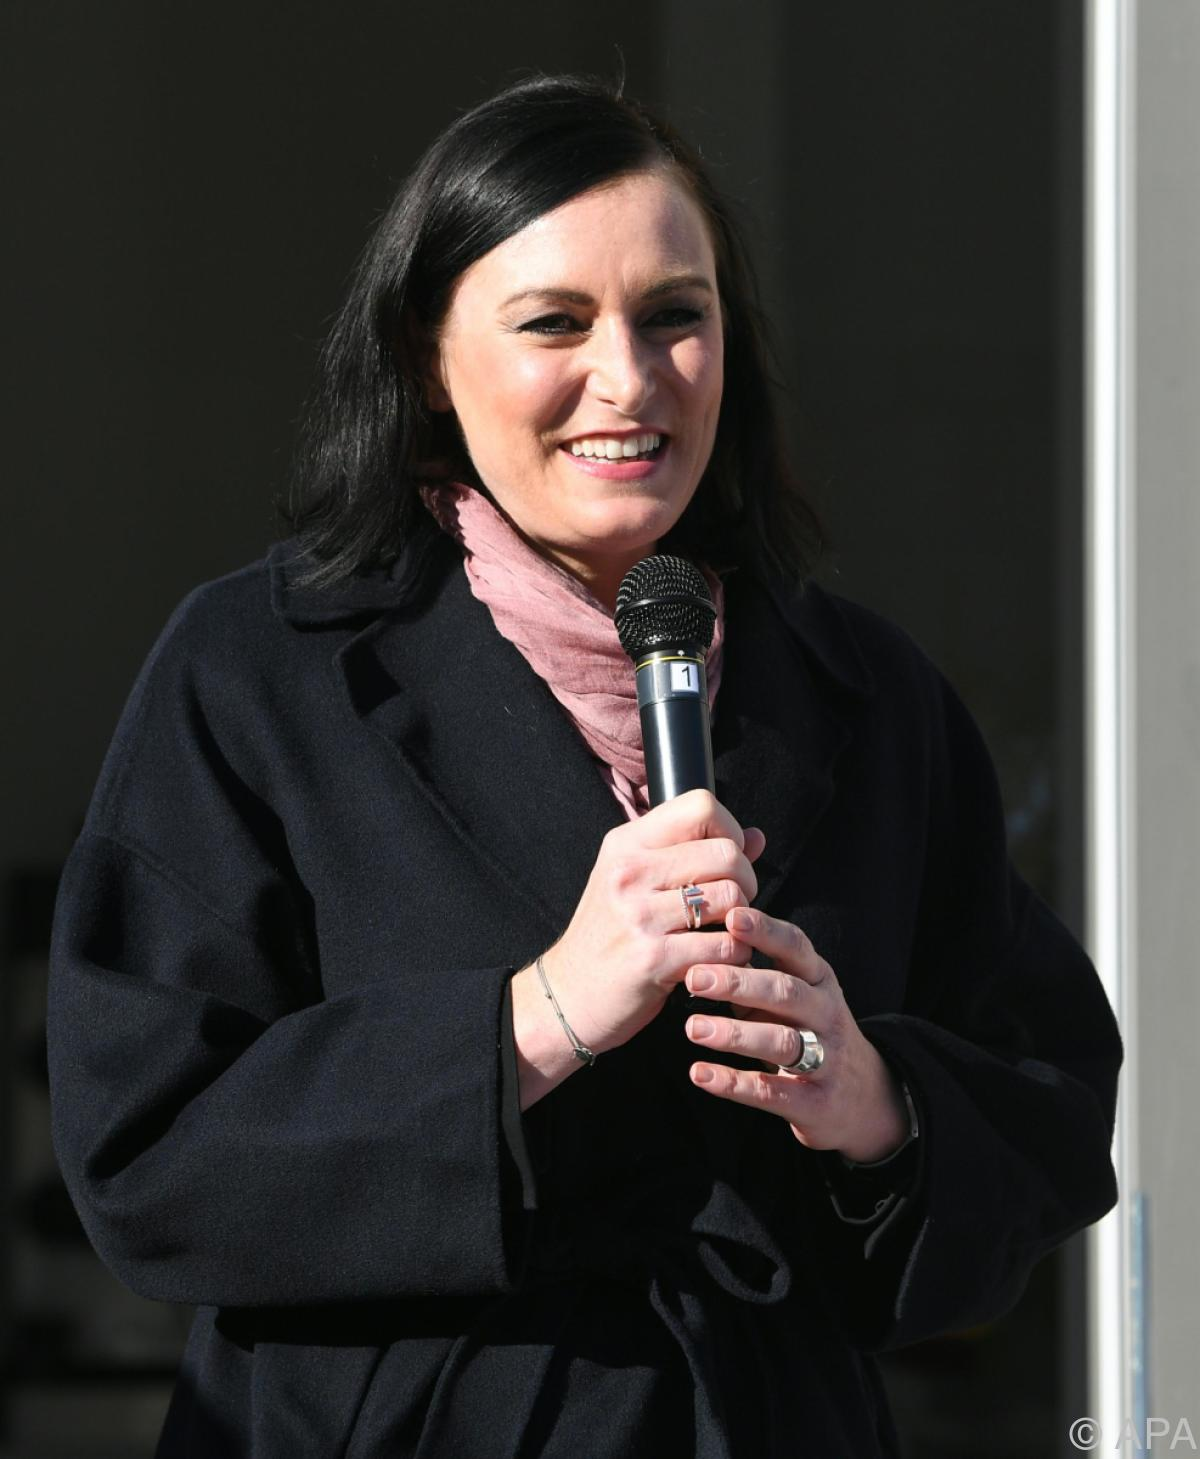 Co2 Reduktionsziel Für Köstinger Größter Eu Vorsitz Erfolg